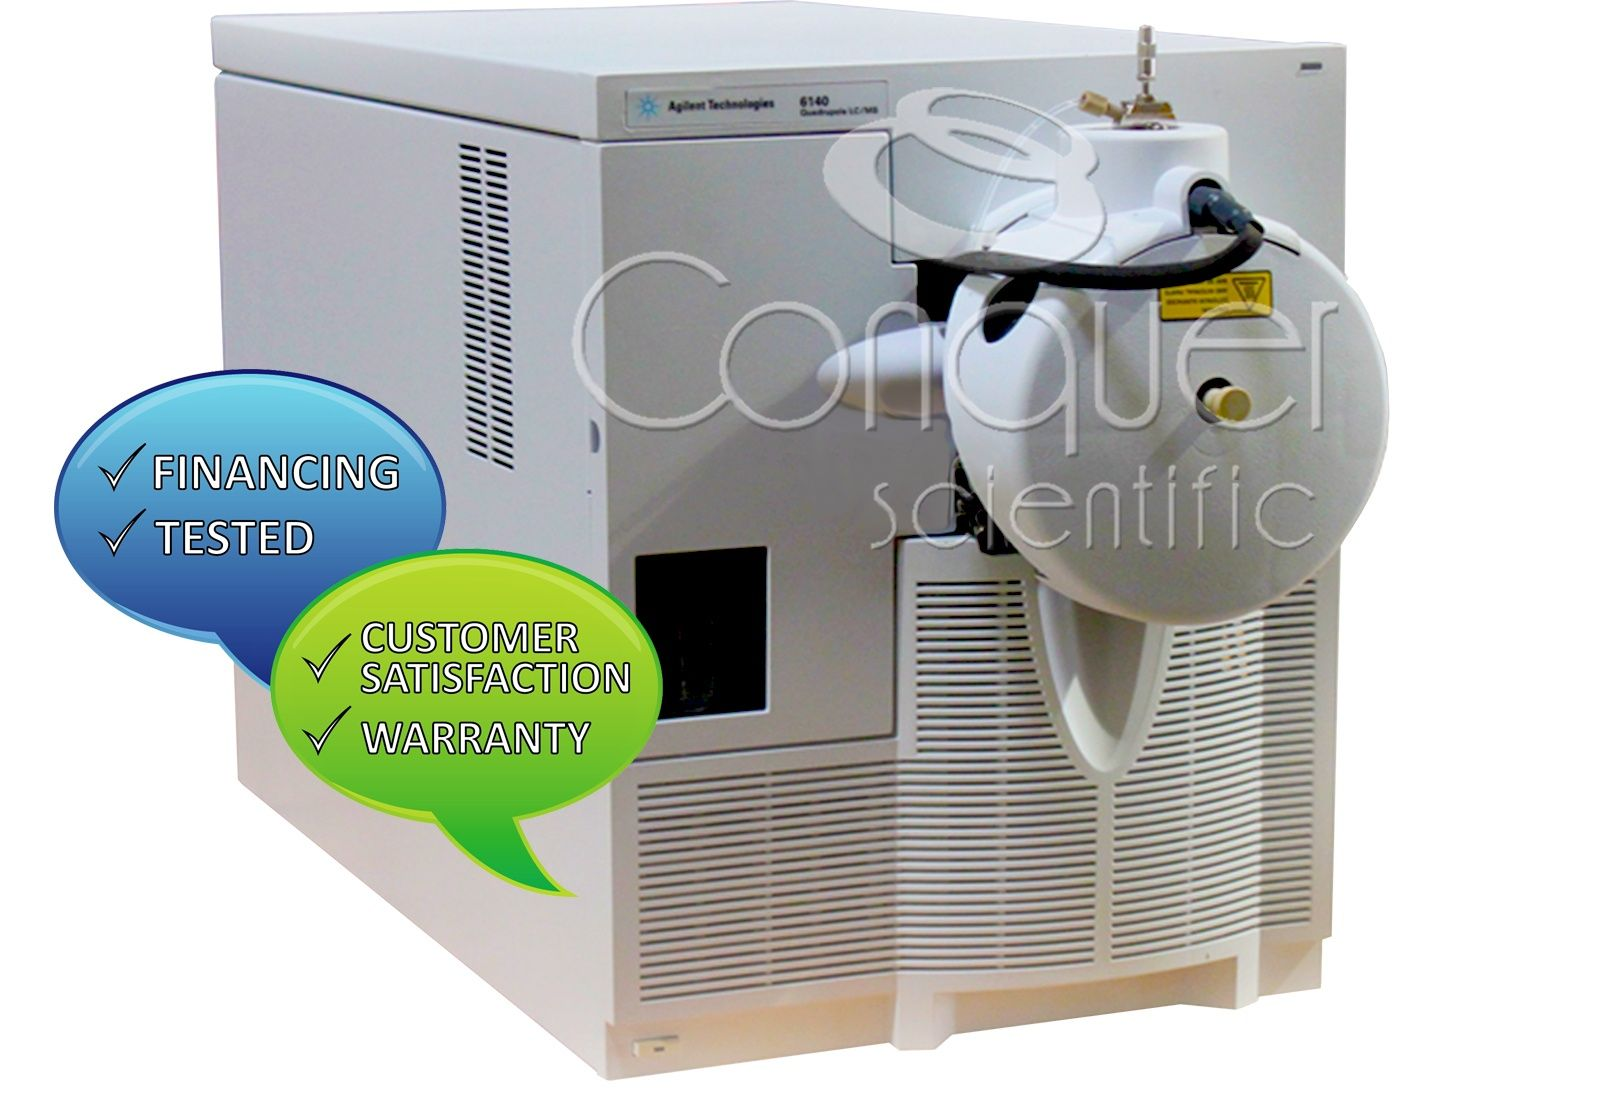 Agilent 6140 Series Quadrupole LCMS / LC-MS / MSD